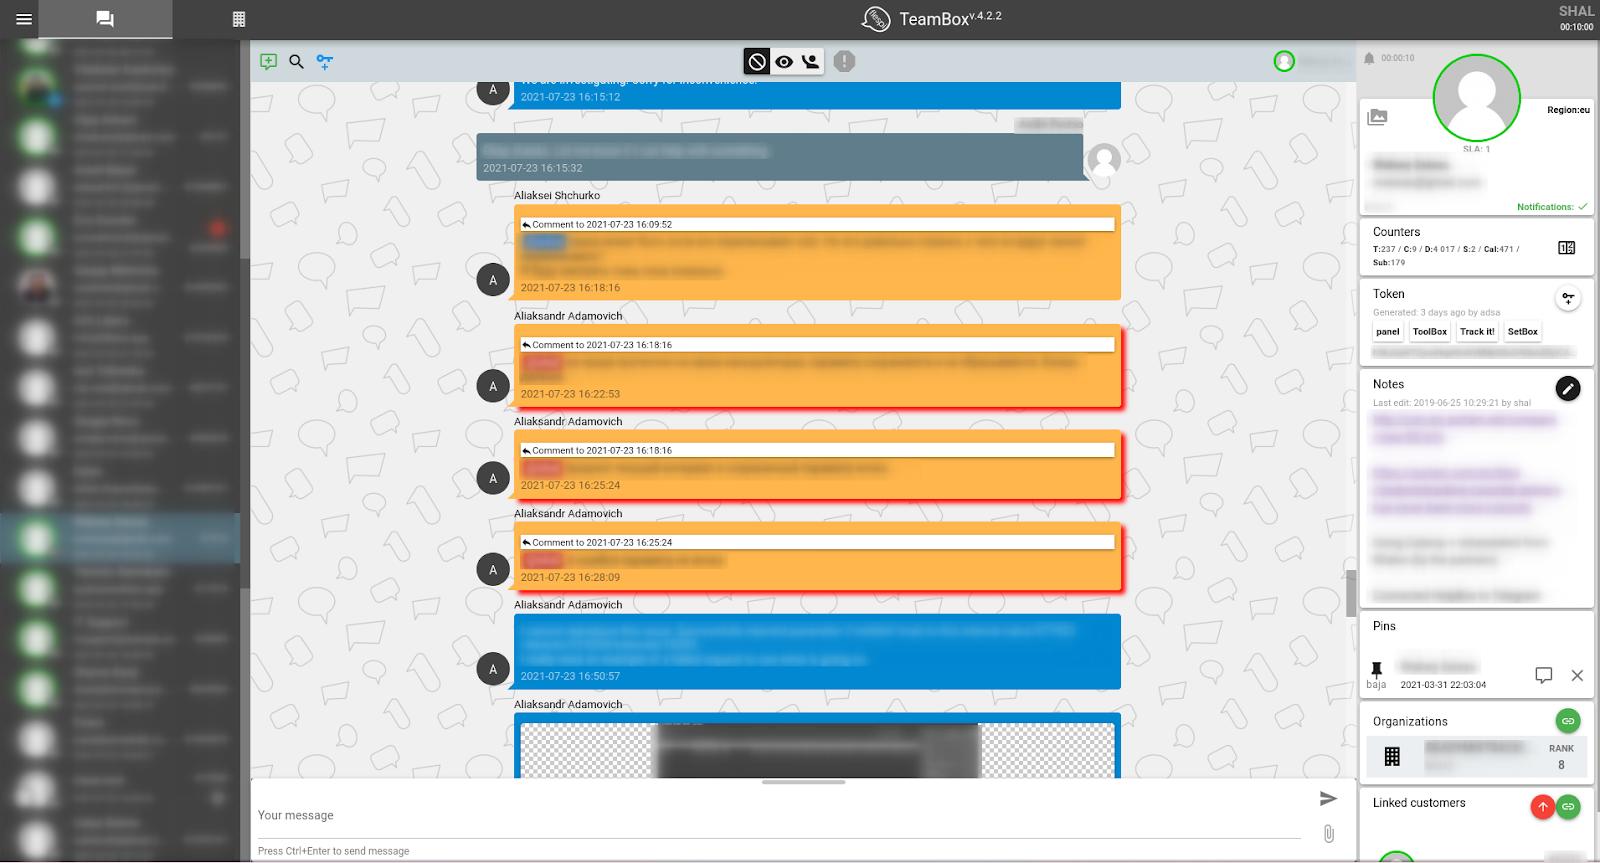 flespi teambox chat screen